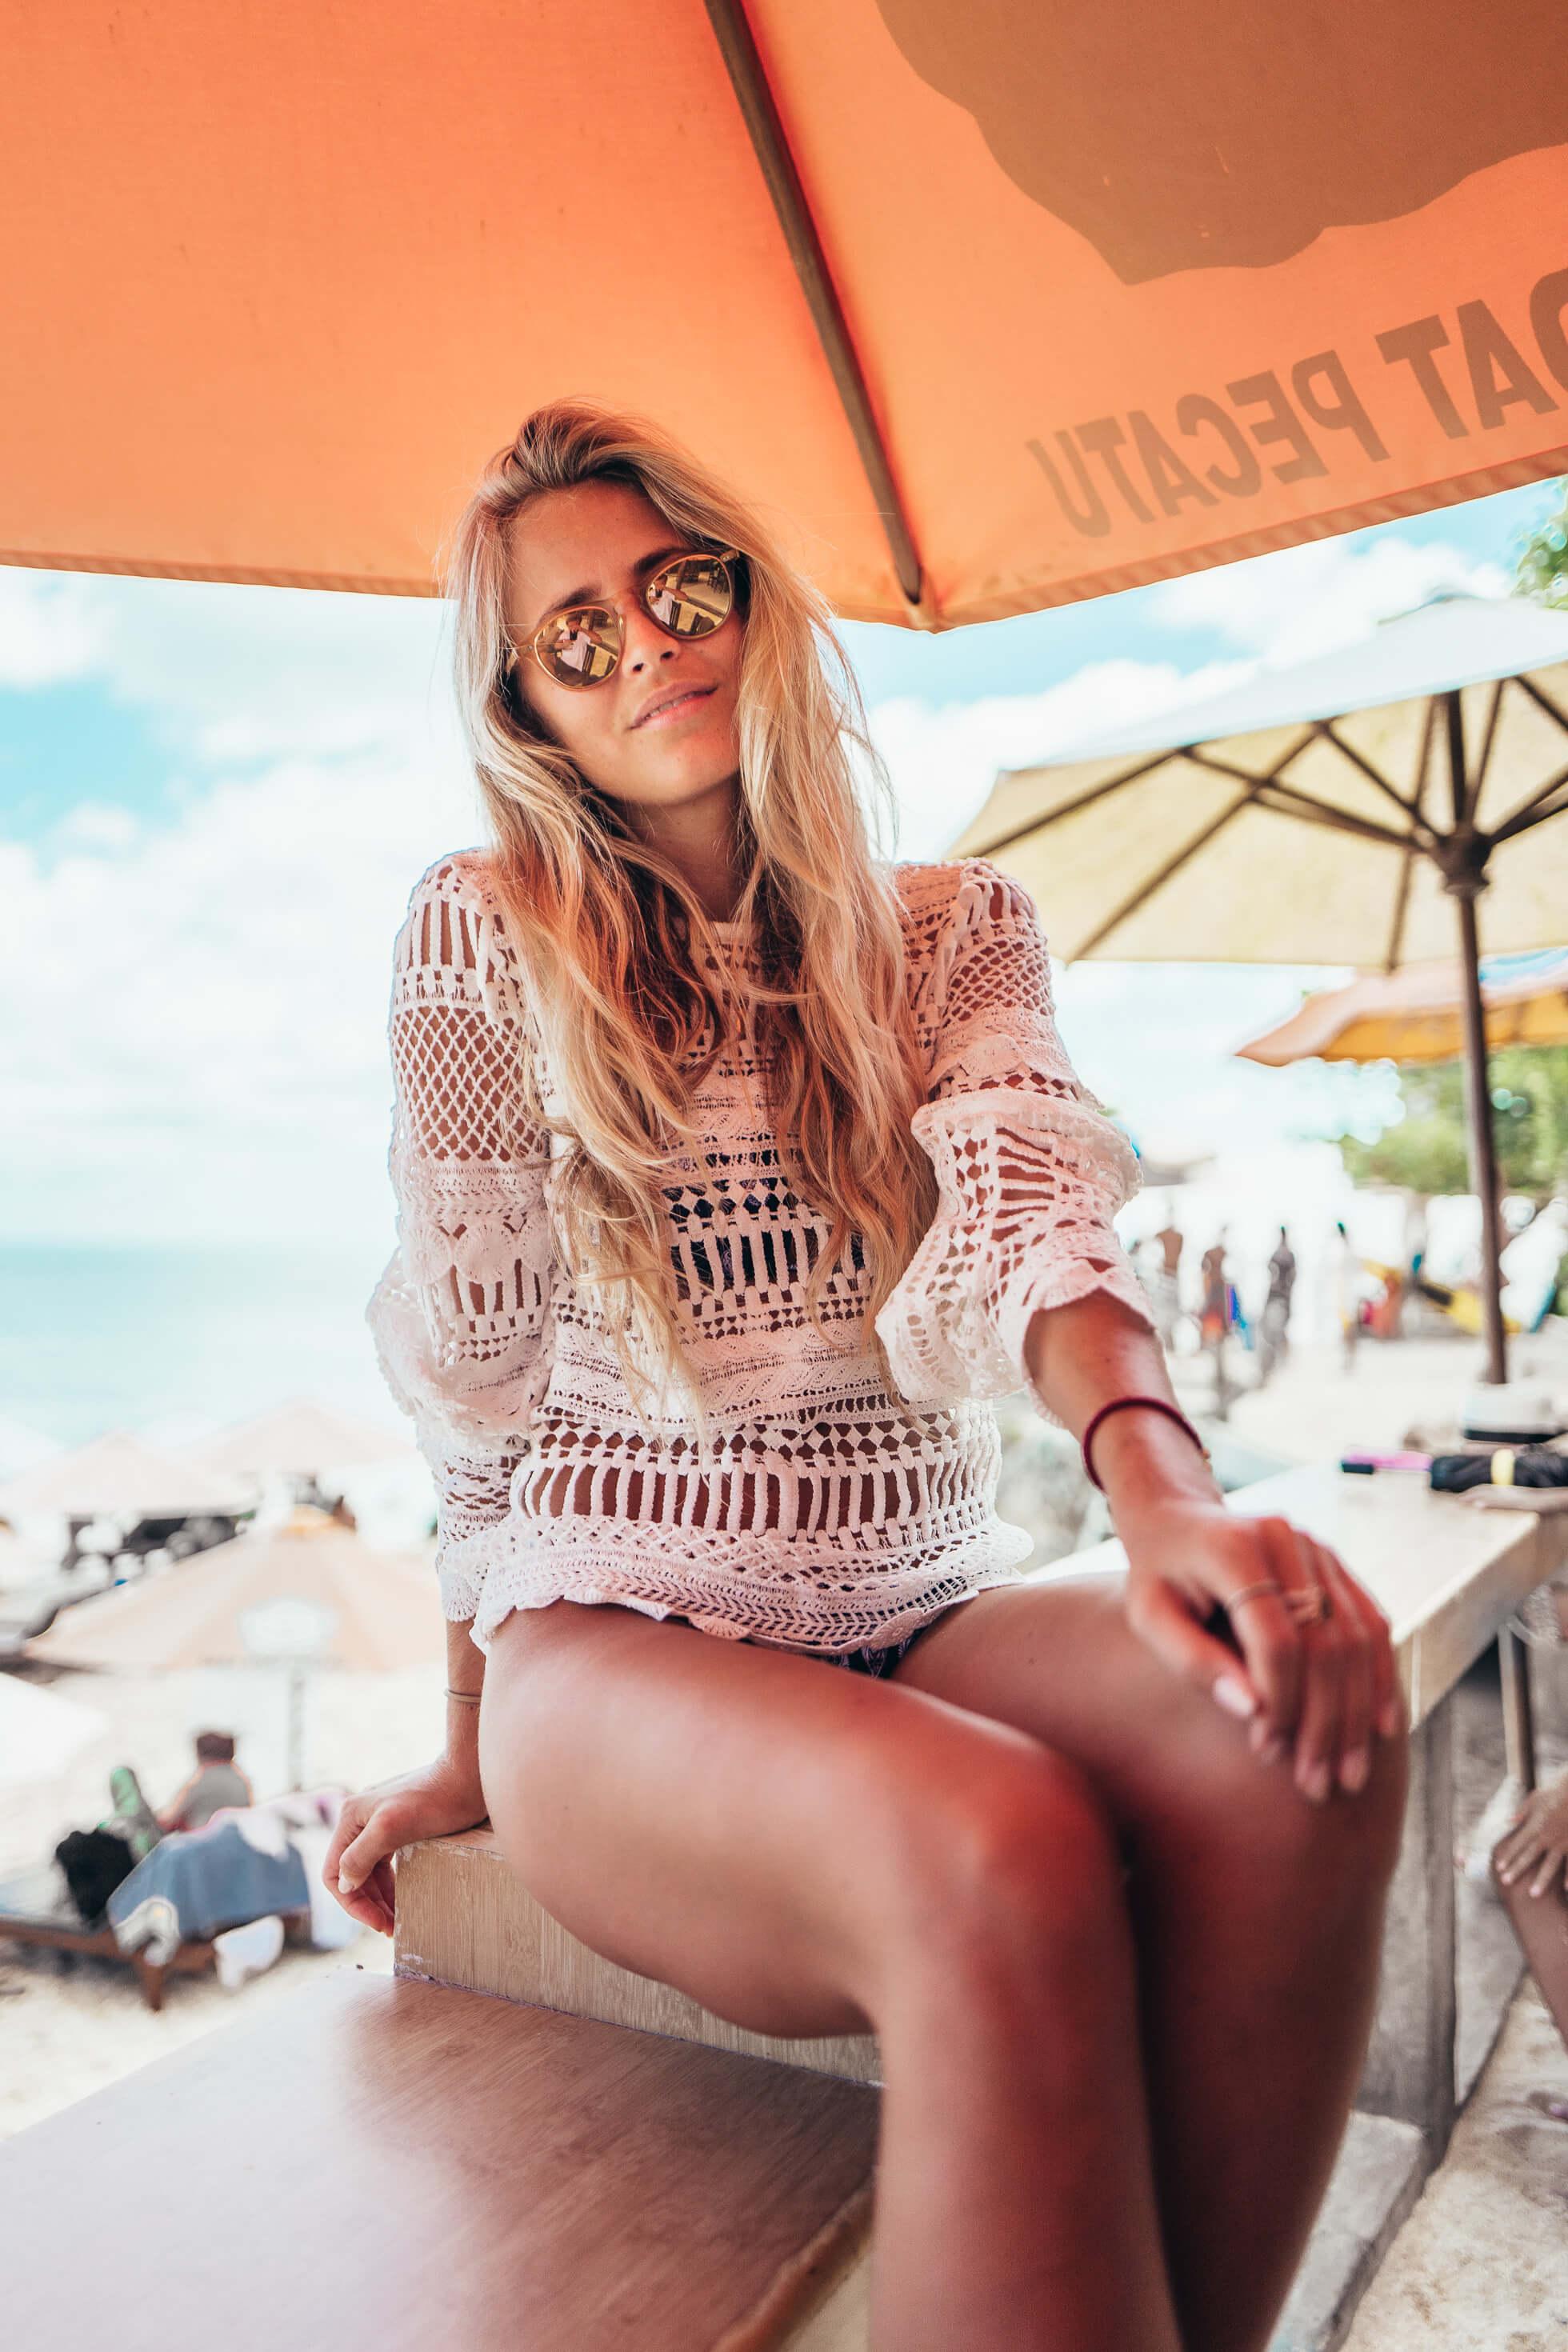 janni-deler-dreamland-beach-baliL1010623